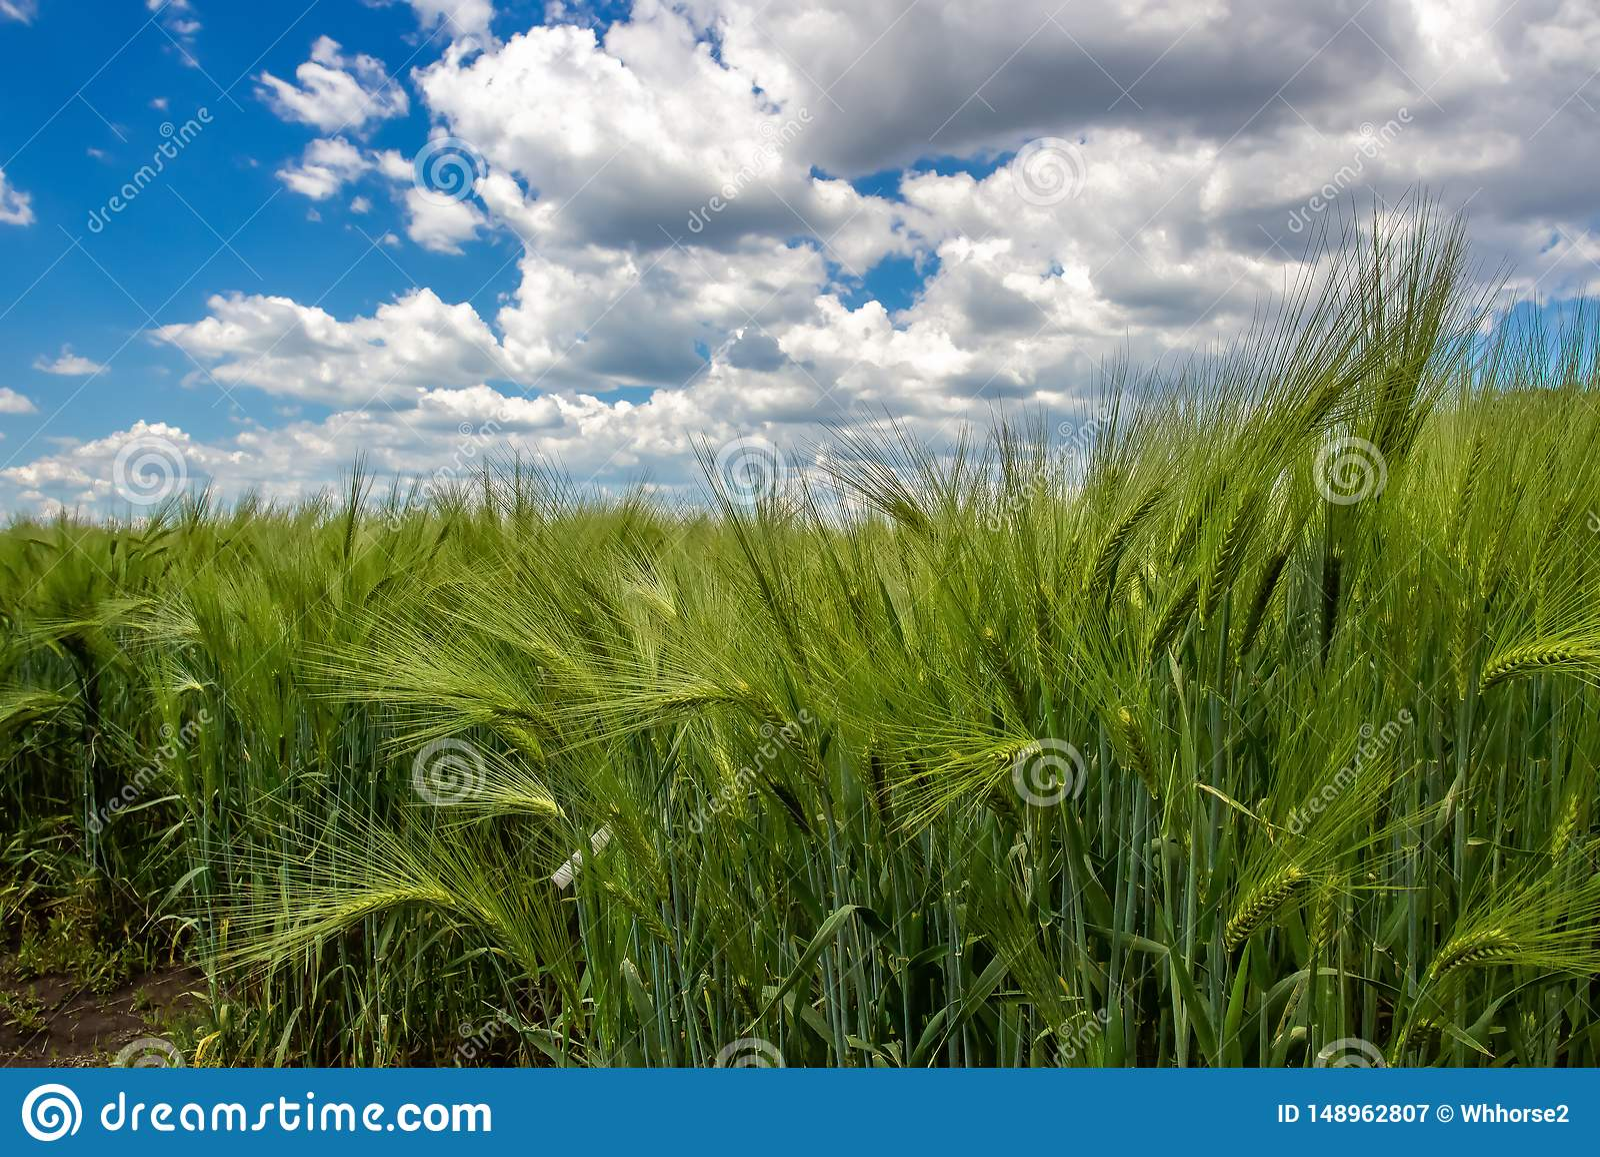 Gr?na spikelets av vete mot en bakgrund av bl? himmel och stackmolnmoln